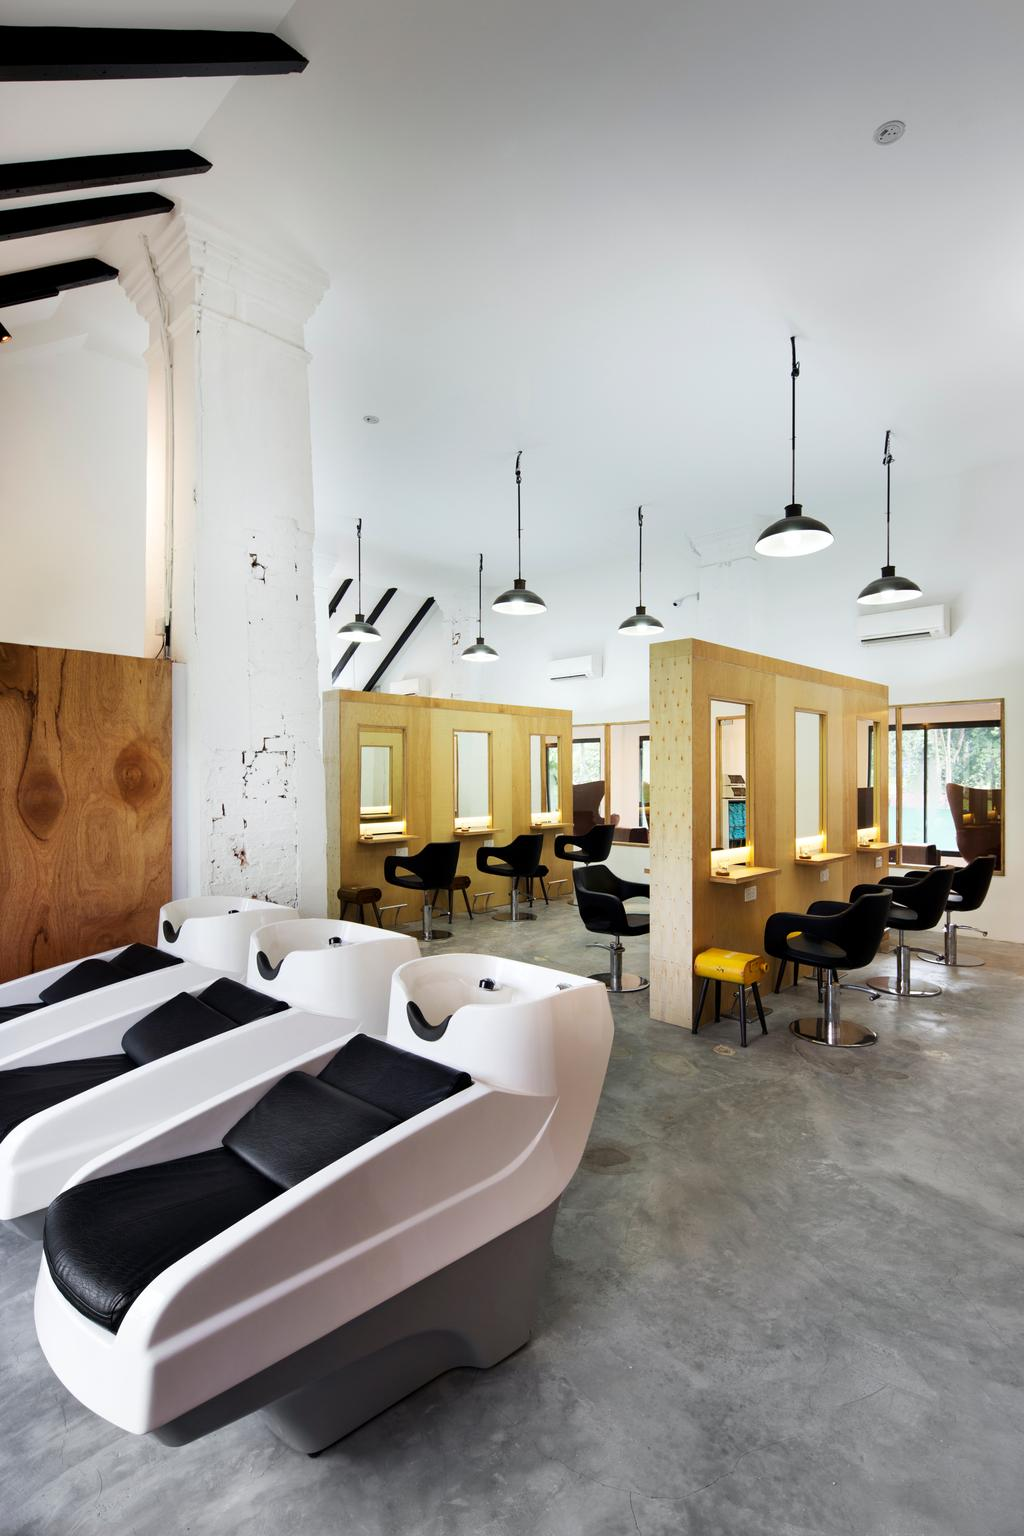 Loewen road, Commercial, Interior Designer, Design by Fifteen Pte Ltd, Contemporary, Indoors, Interior Design, Sink, Dining Room, Room, Bathroom